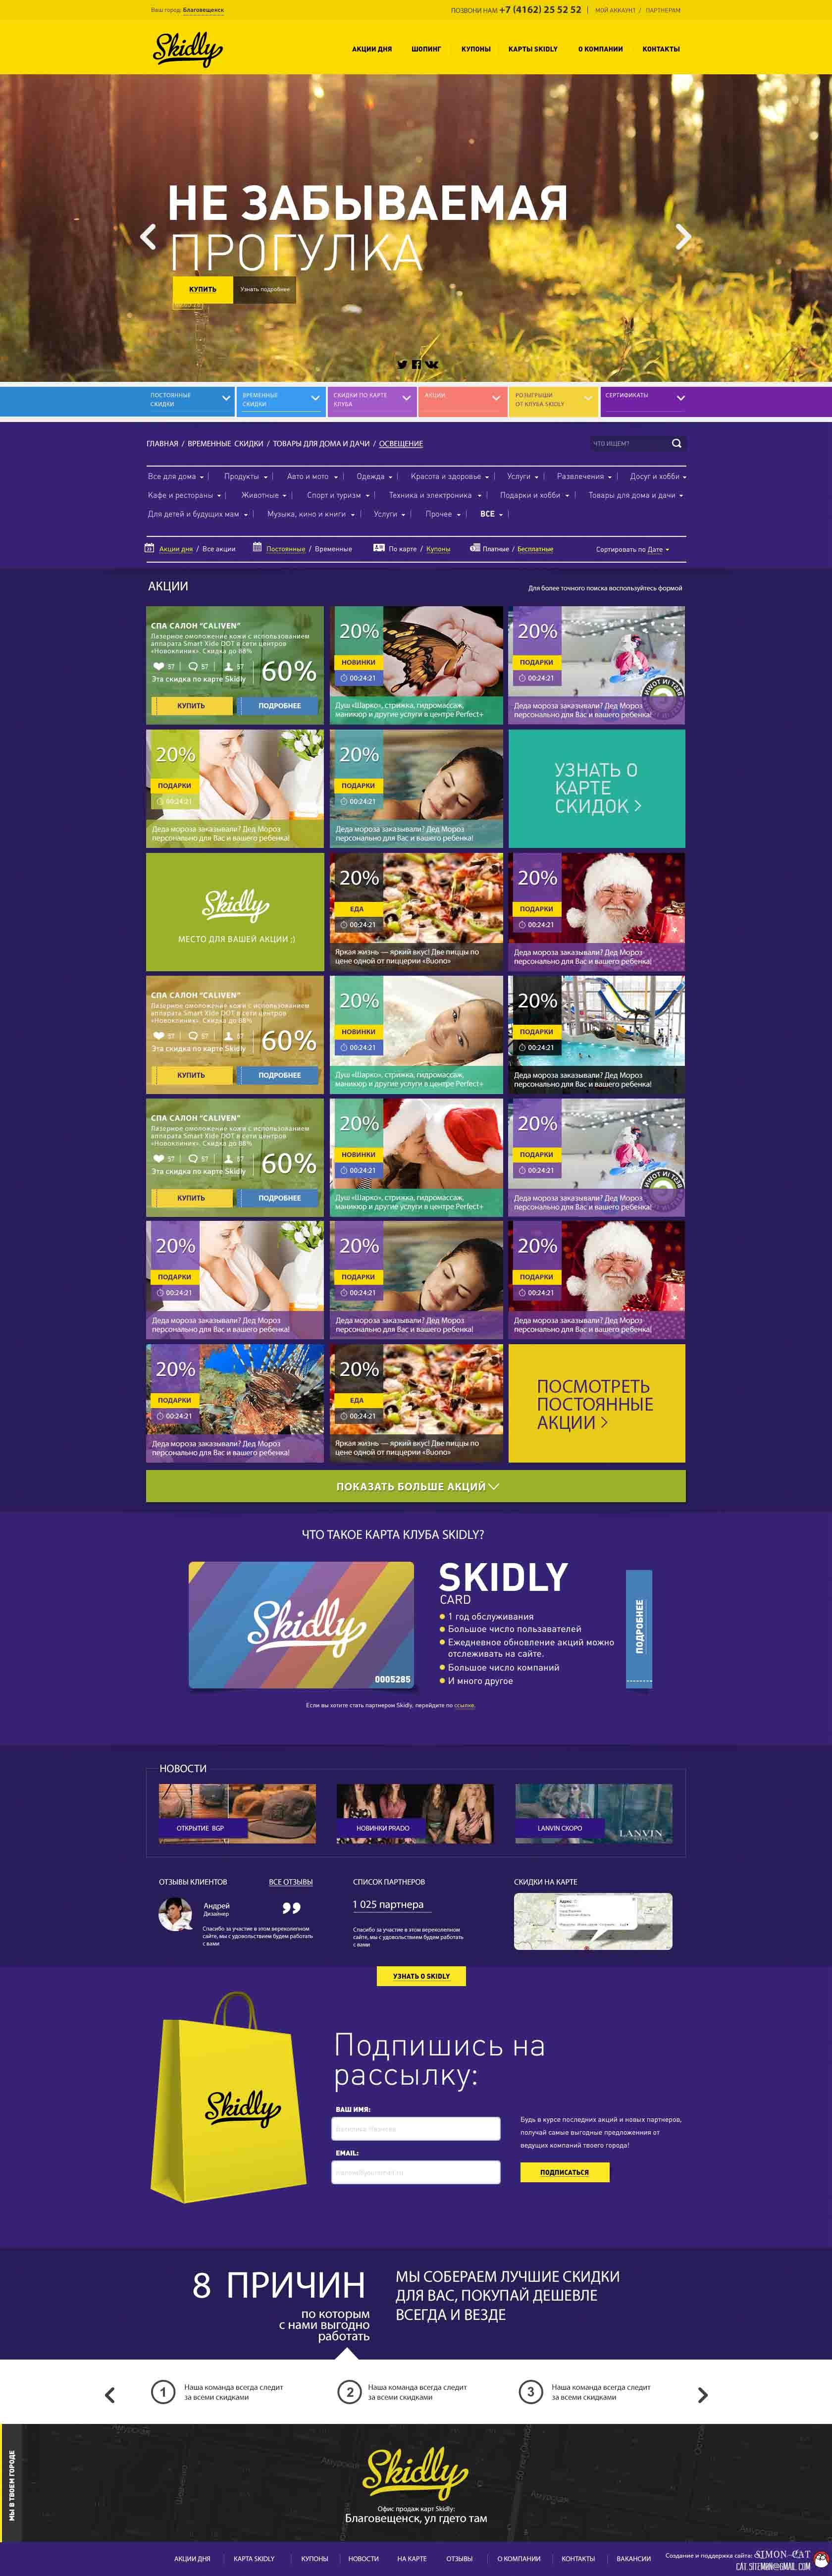 Разработка сайта Skidly